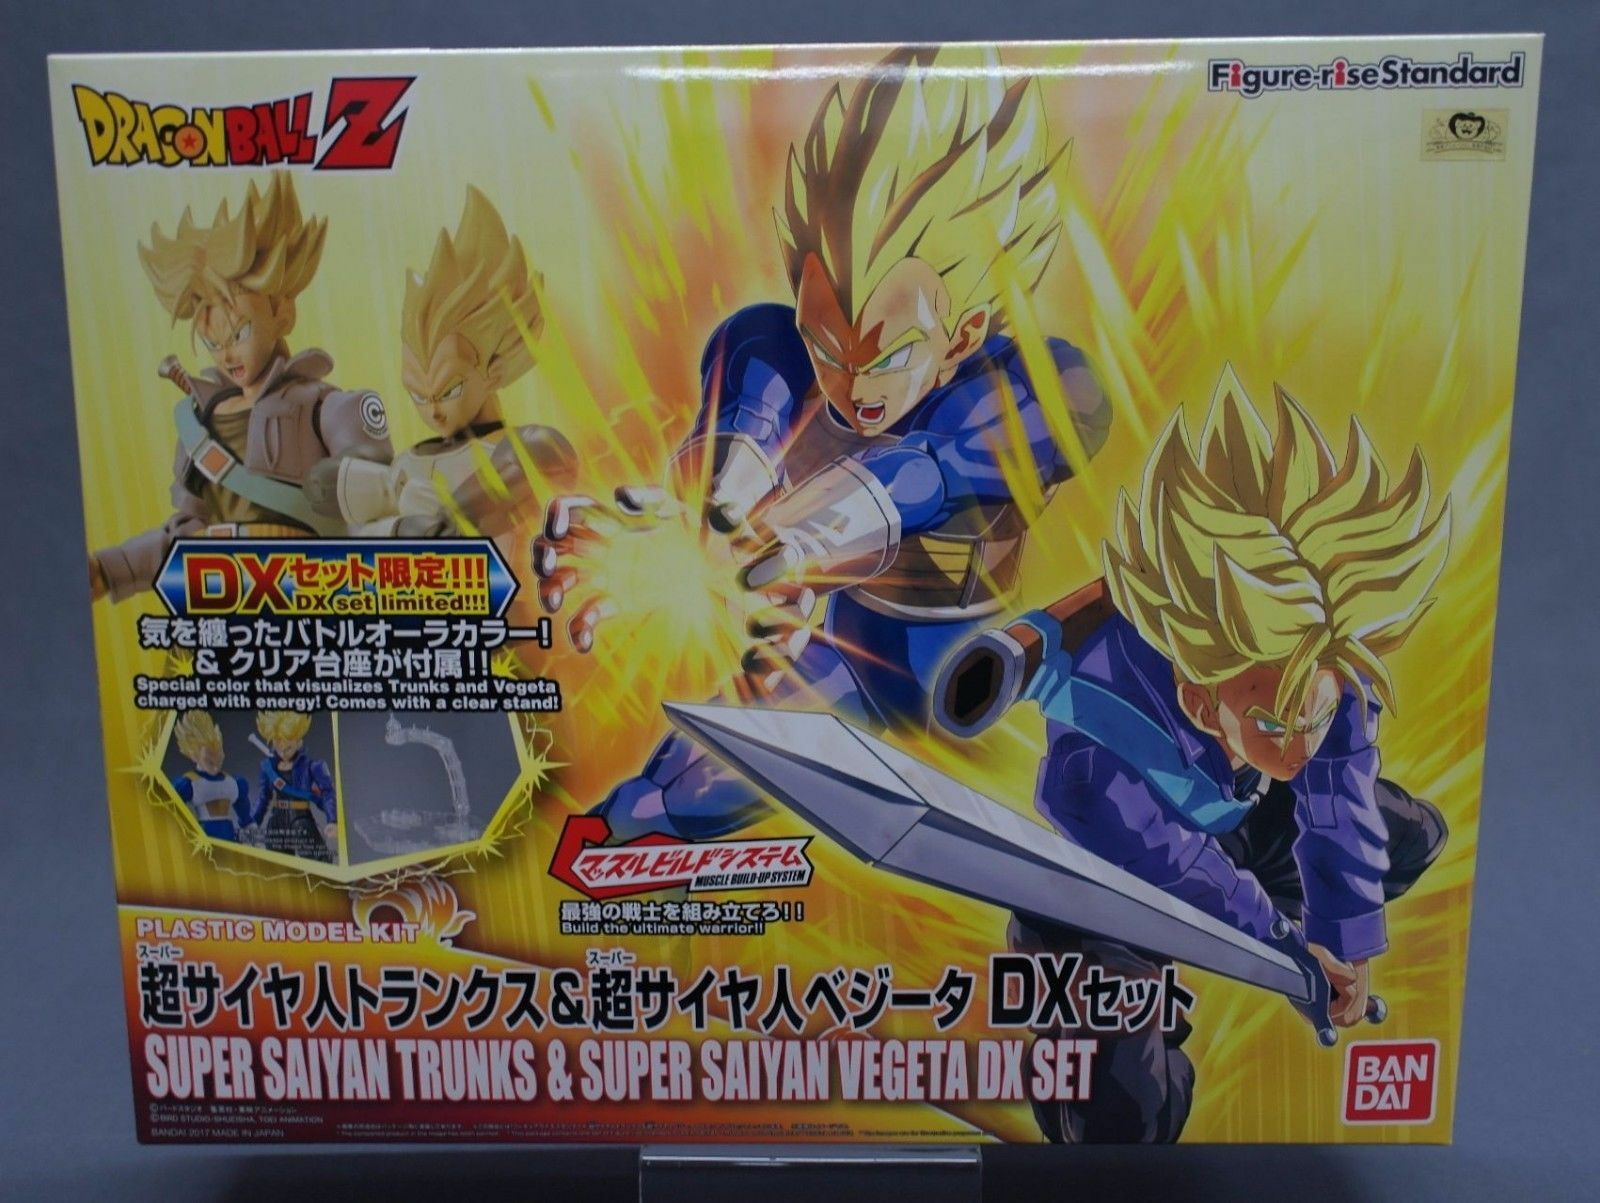 Figure-rise Standard Dragon Ball Z Super Saiyan Trunks & Vegeta DX Set Bandai